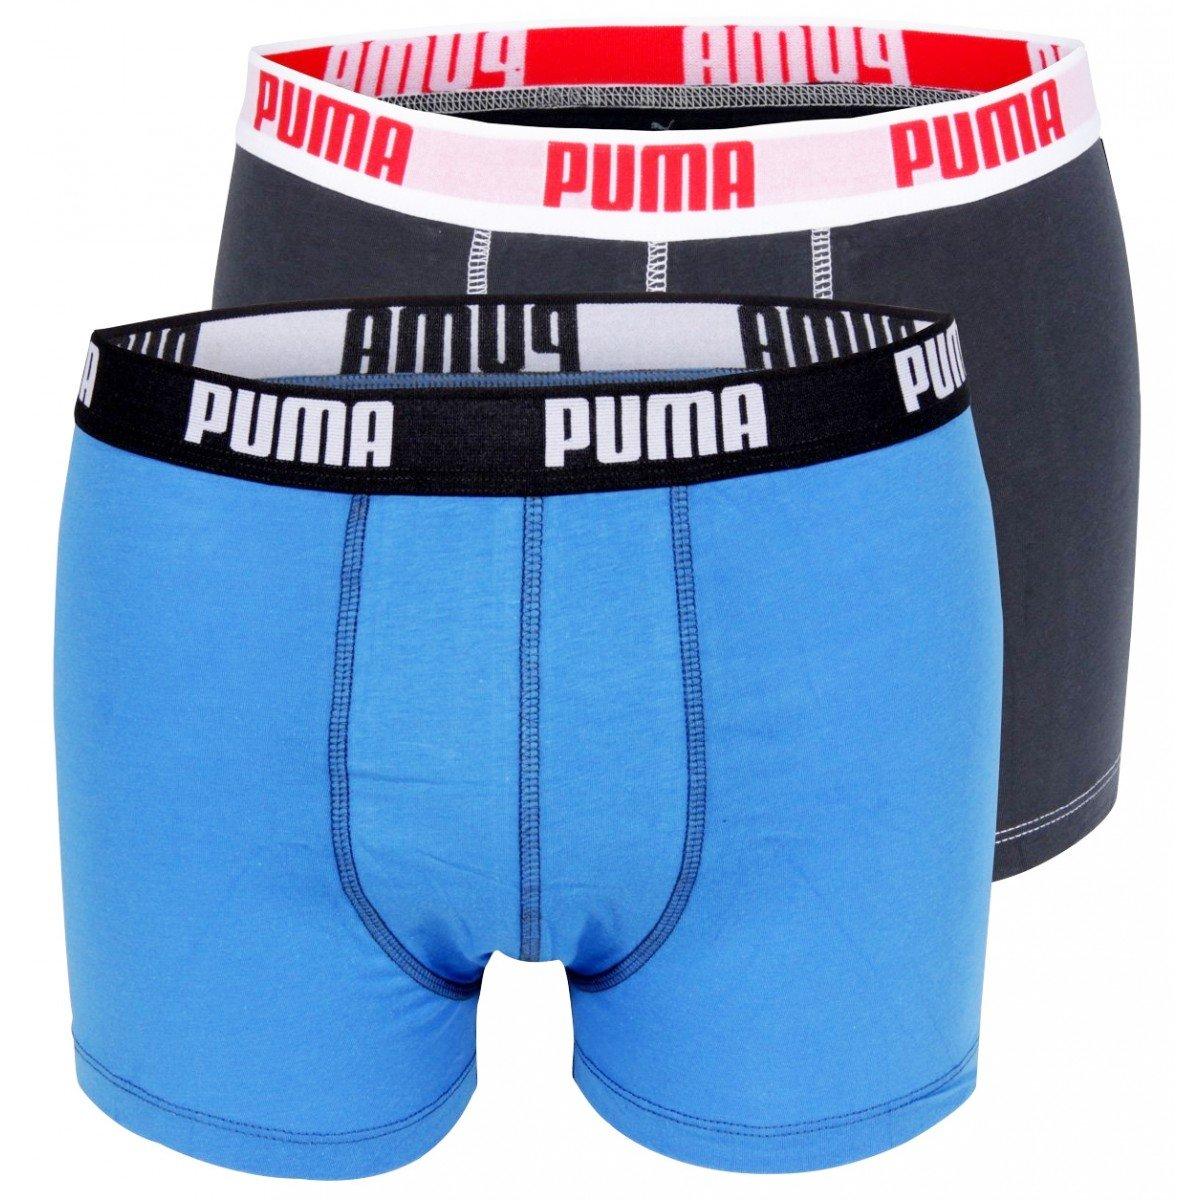 Puma Herren Boxershorts Basic 2er Pack